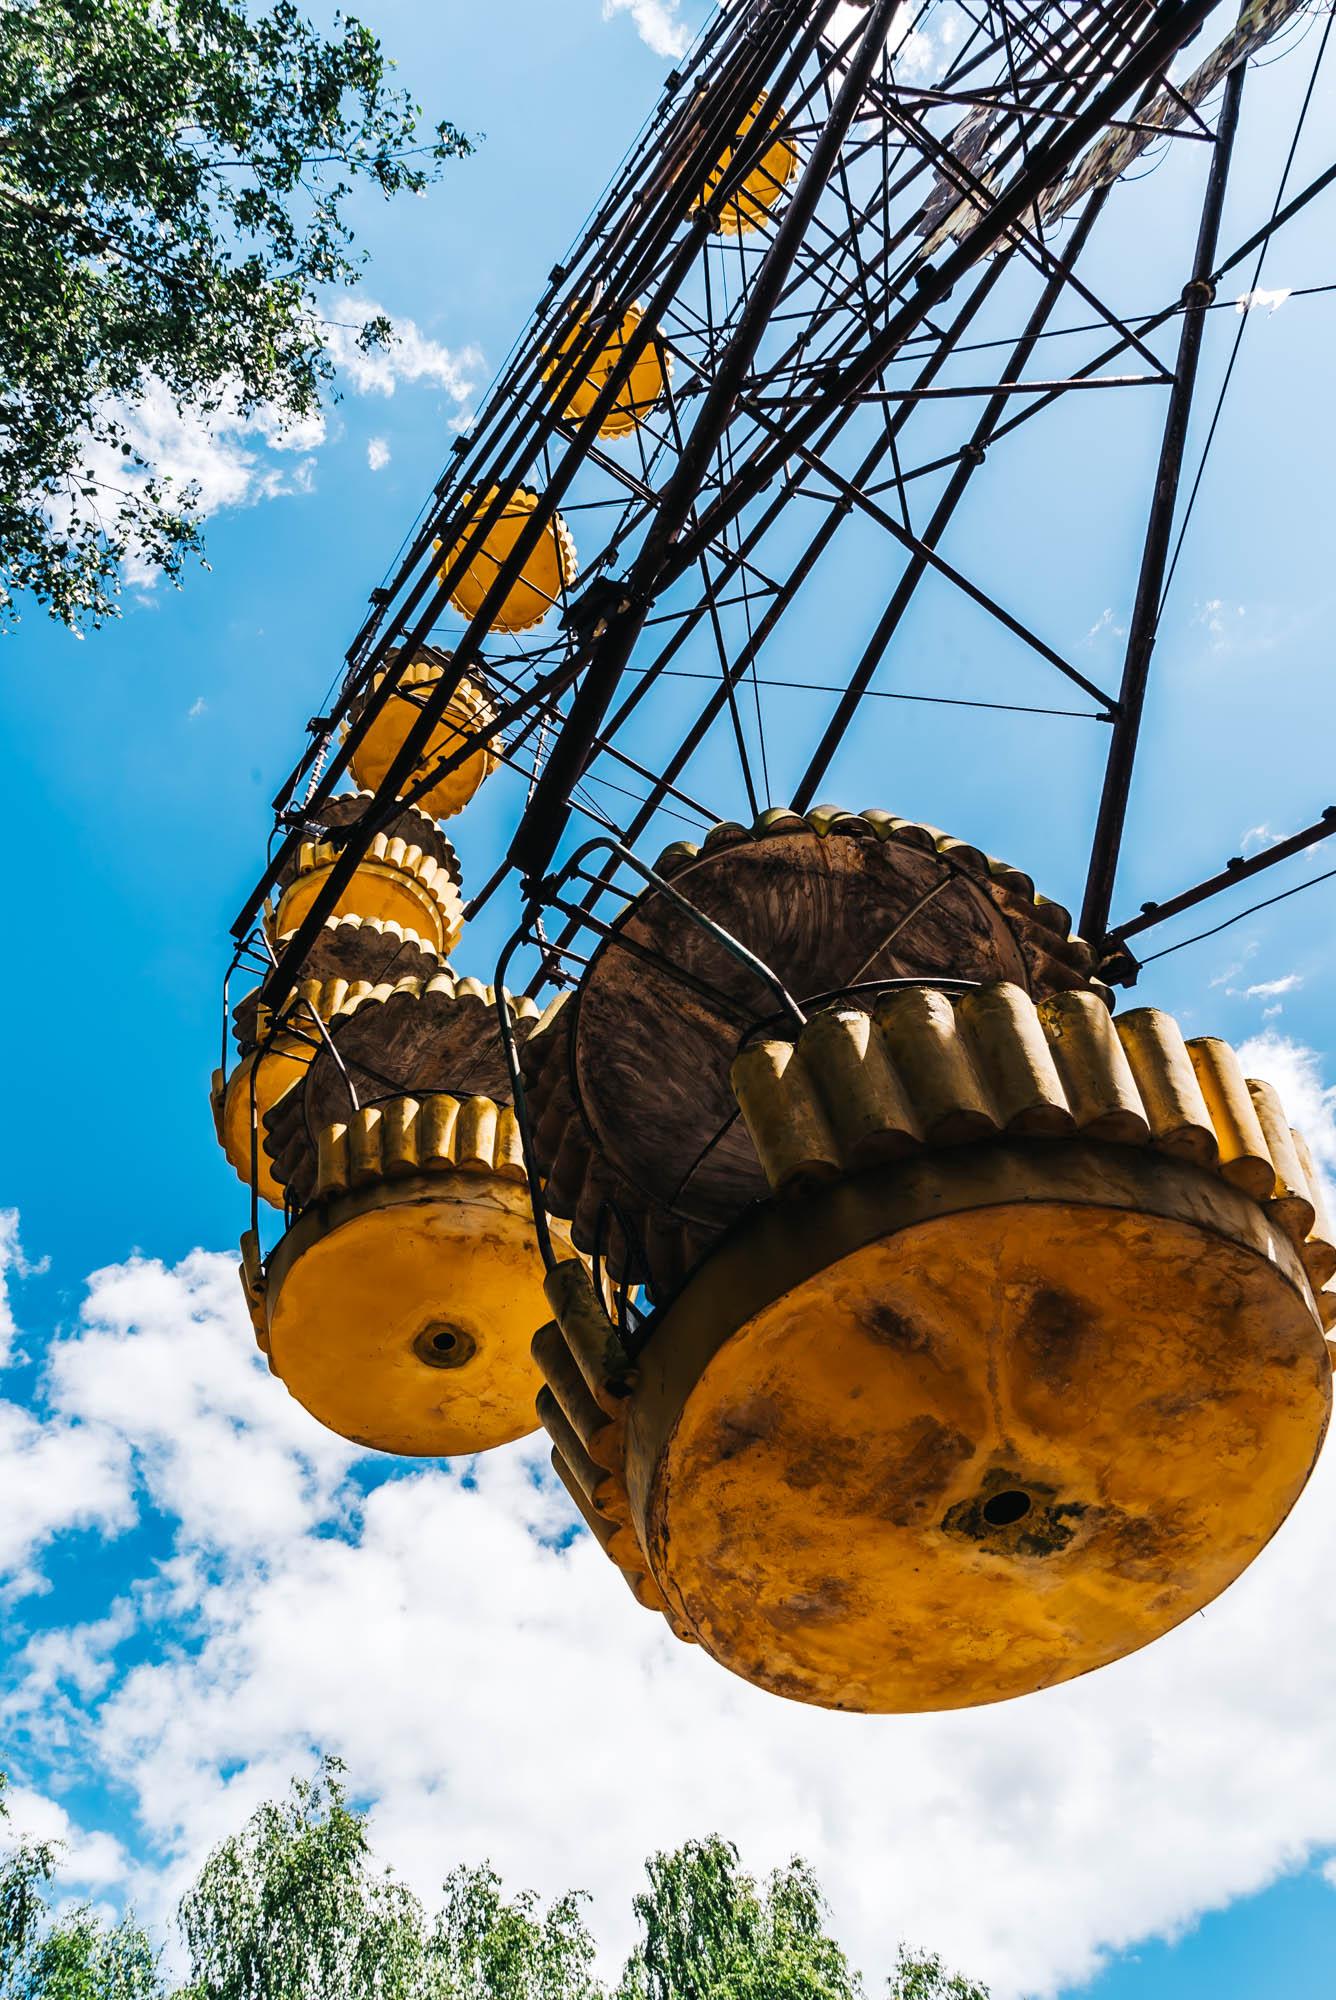 Radioactive cabins of the ferris wheel